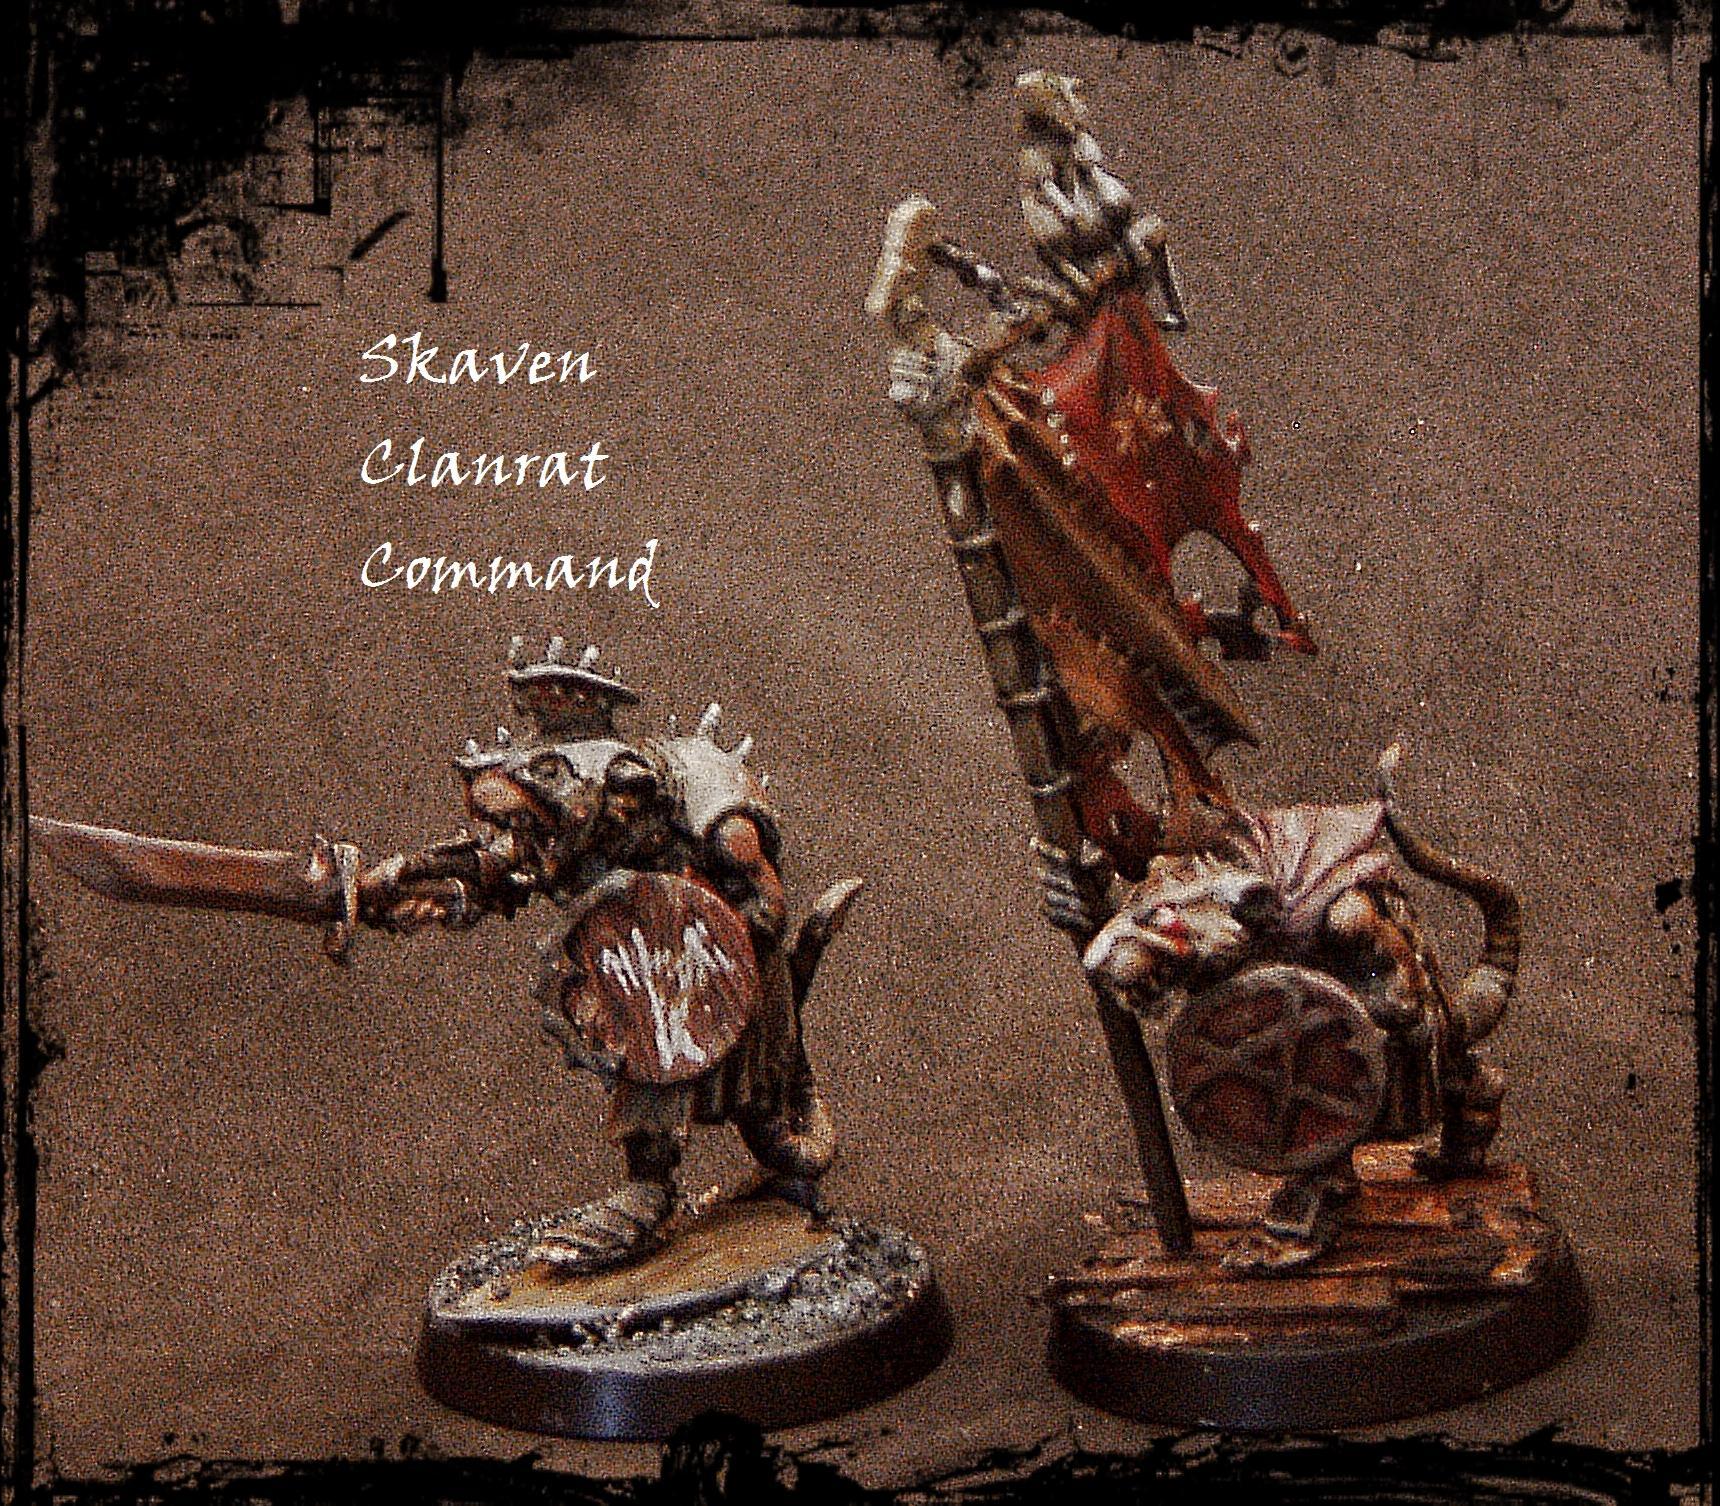 Clanrat, Command, Island Of Blood, Non-Metallic Metal, Skaven